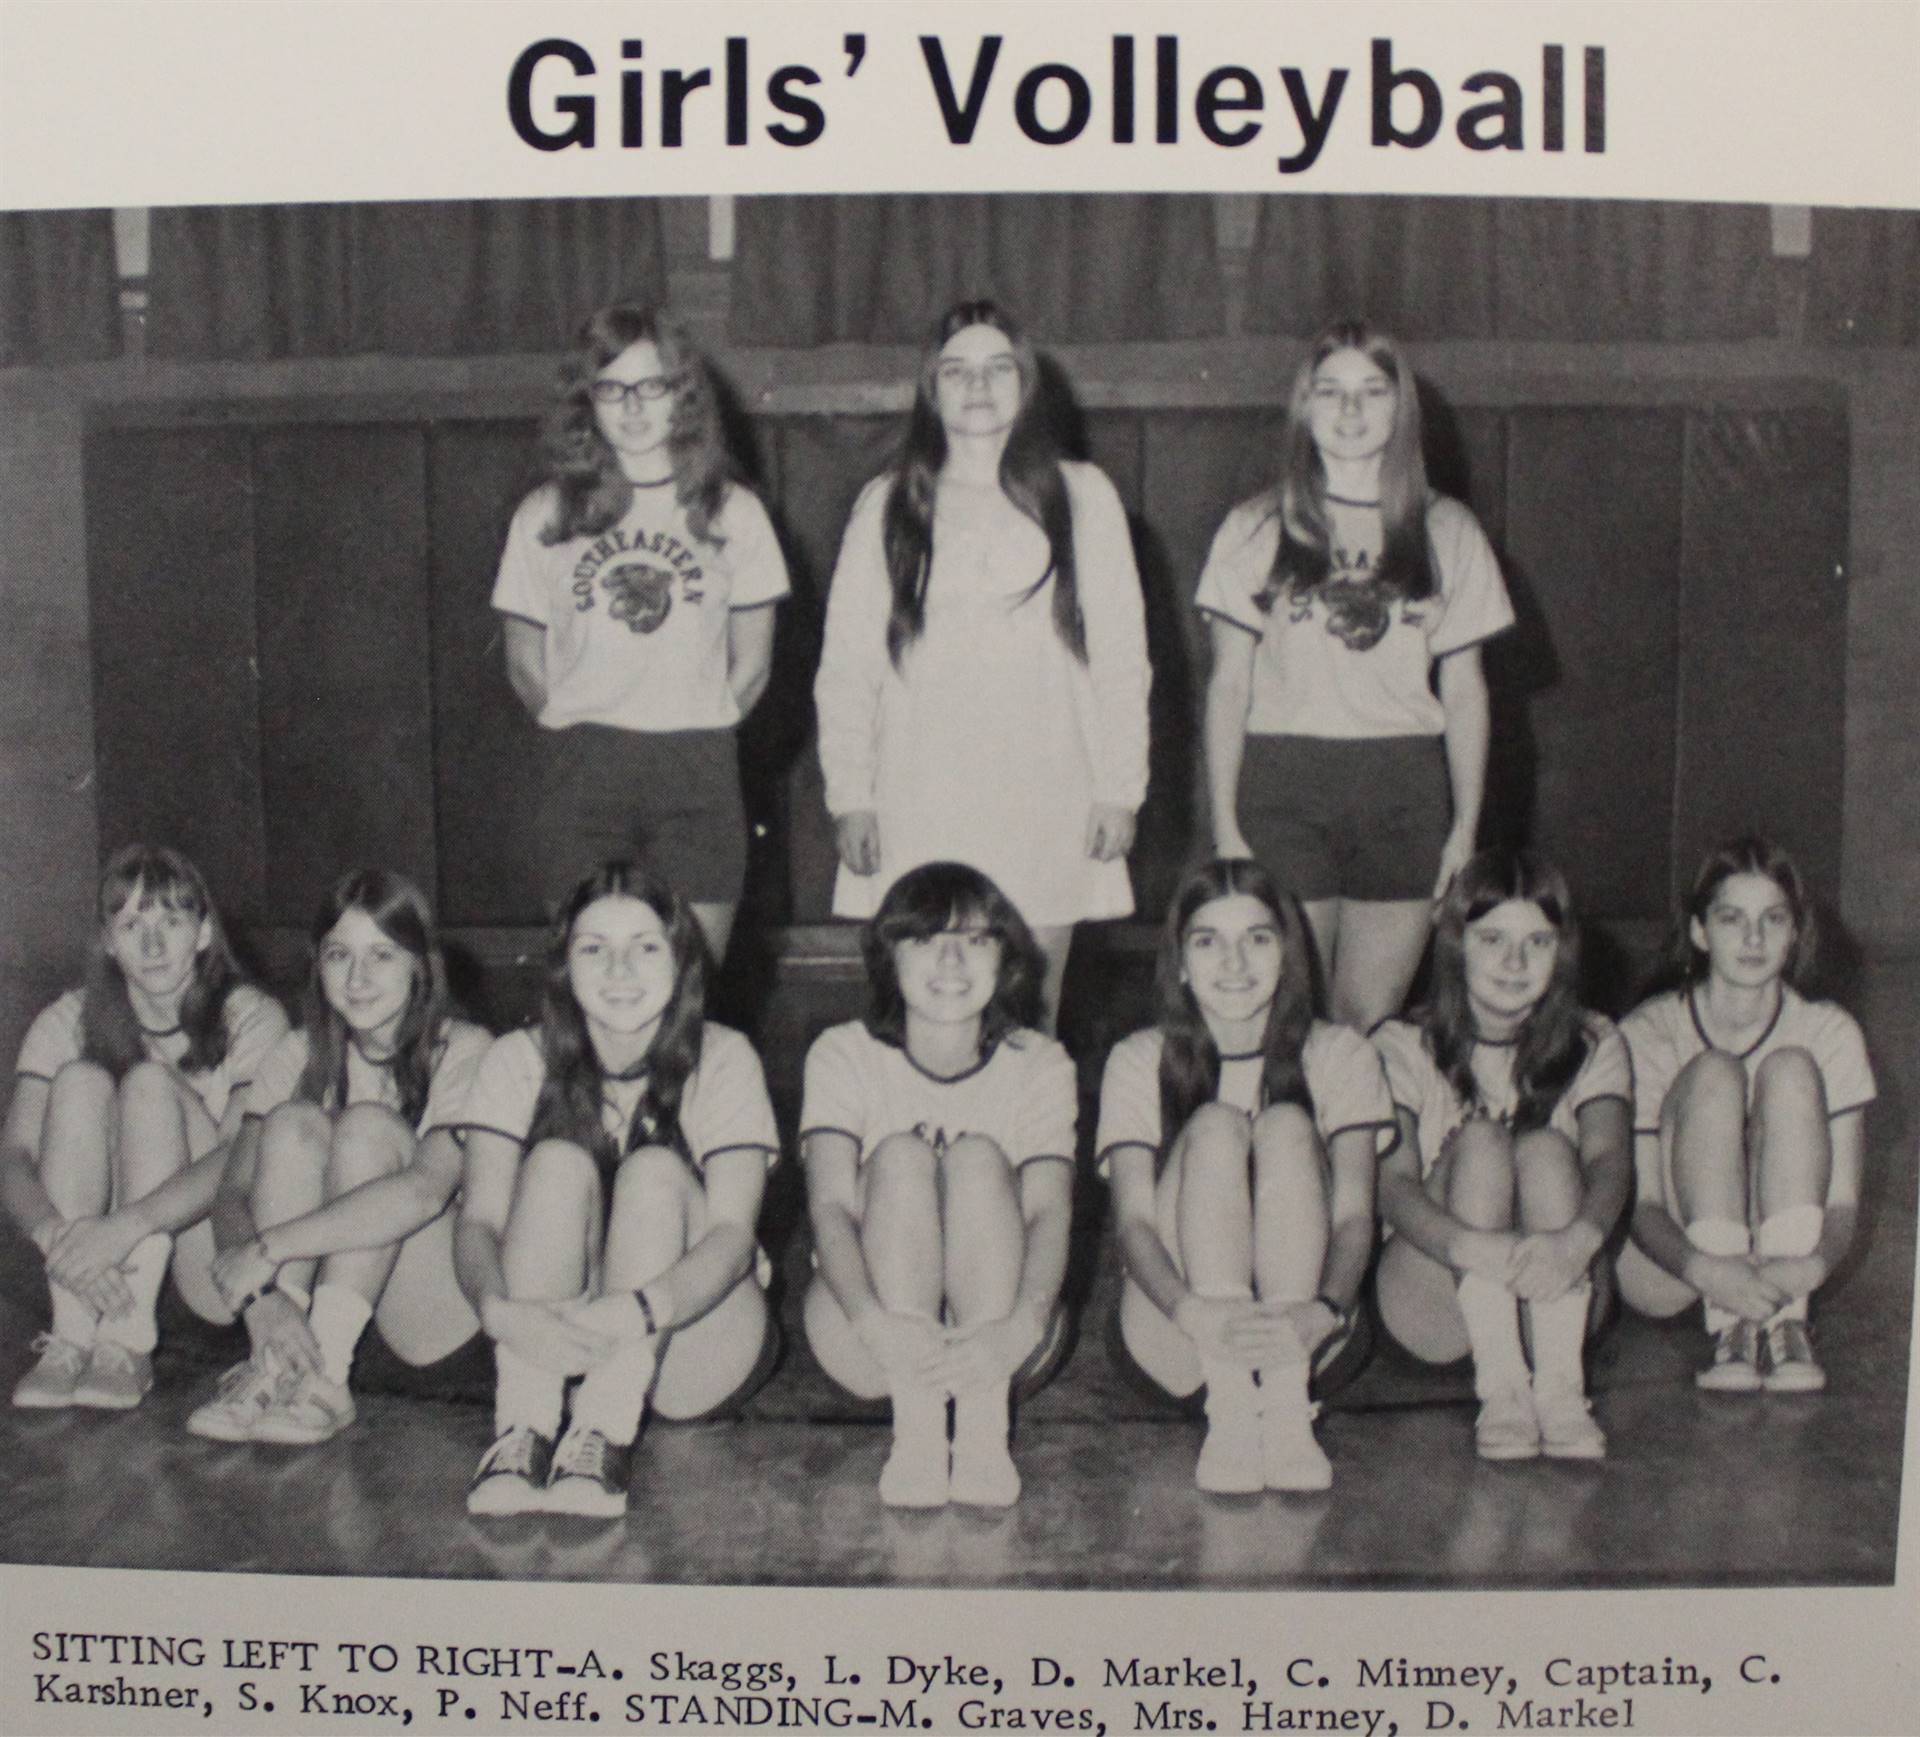 1973 Girls' Volleyball